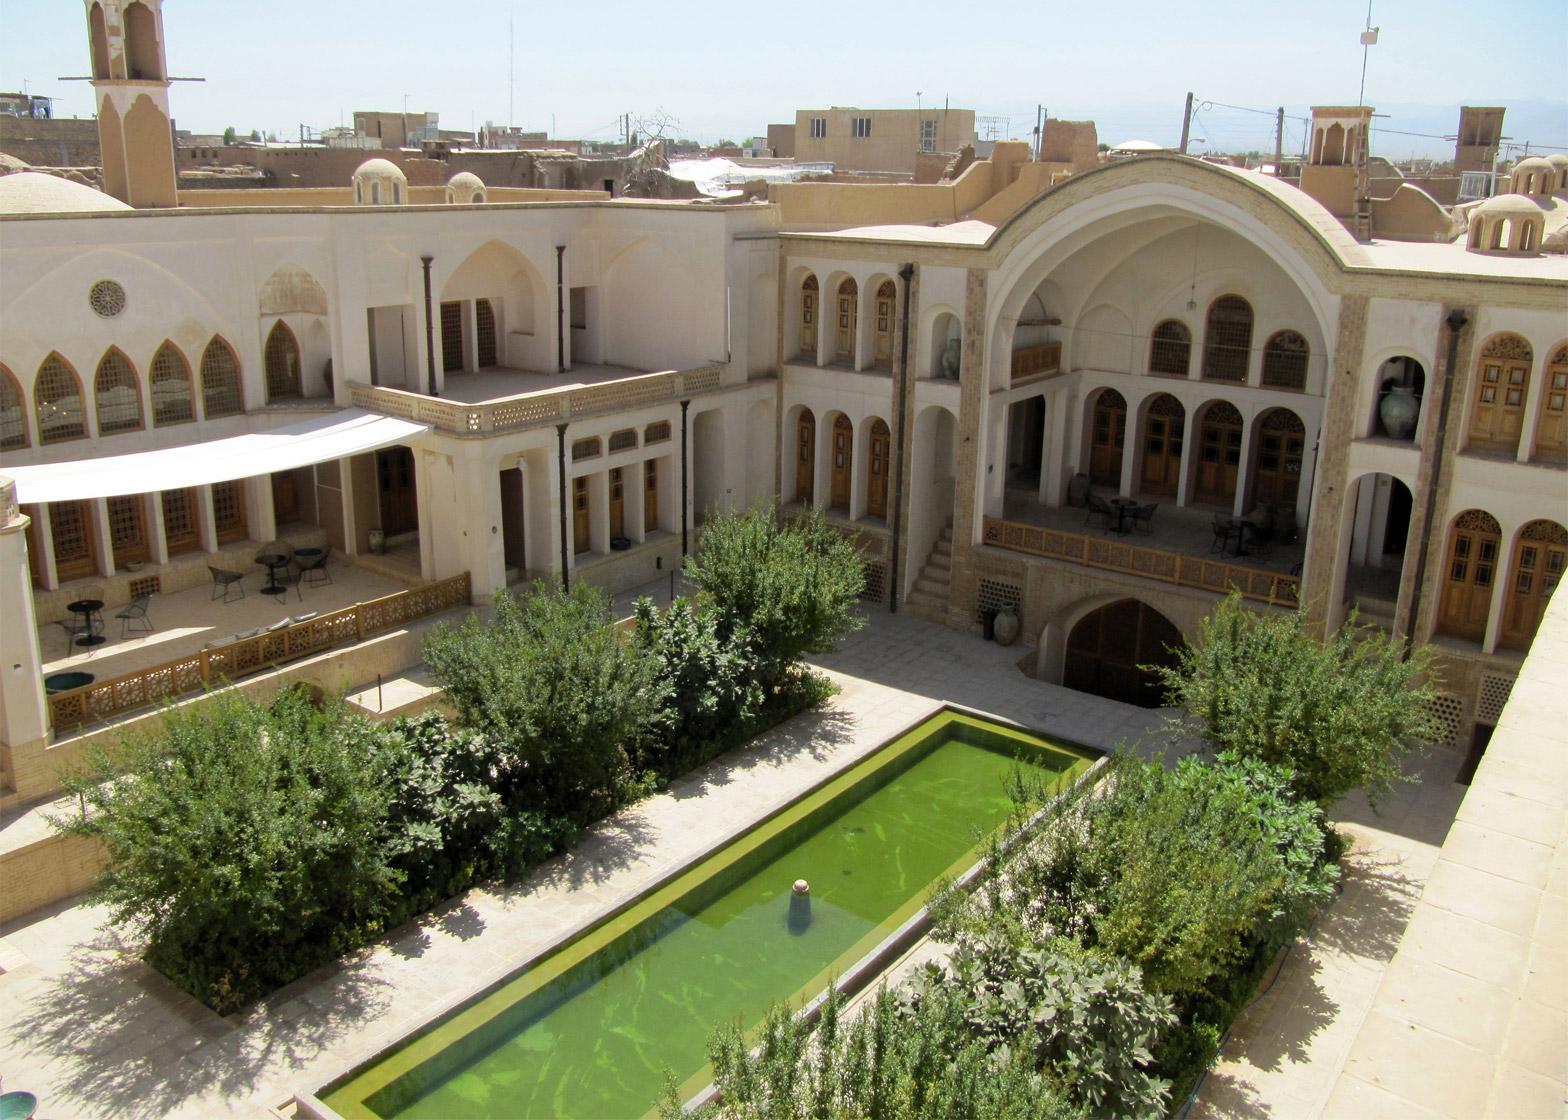 Manouchehri House, Kashan, Iran; by Akbar Helli, Shahnaz Nader